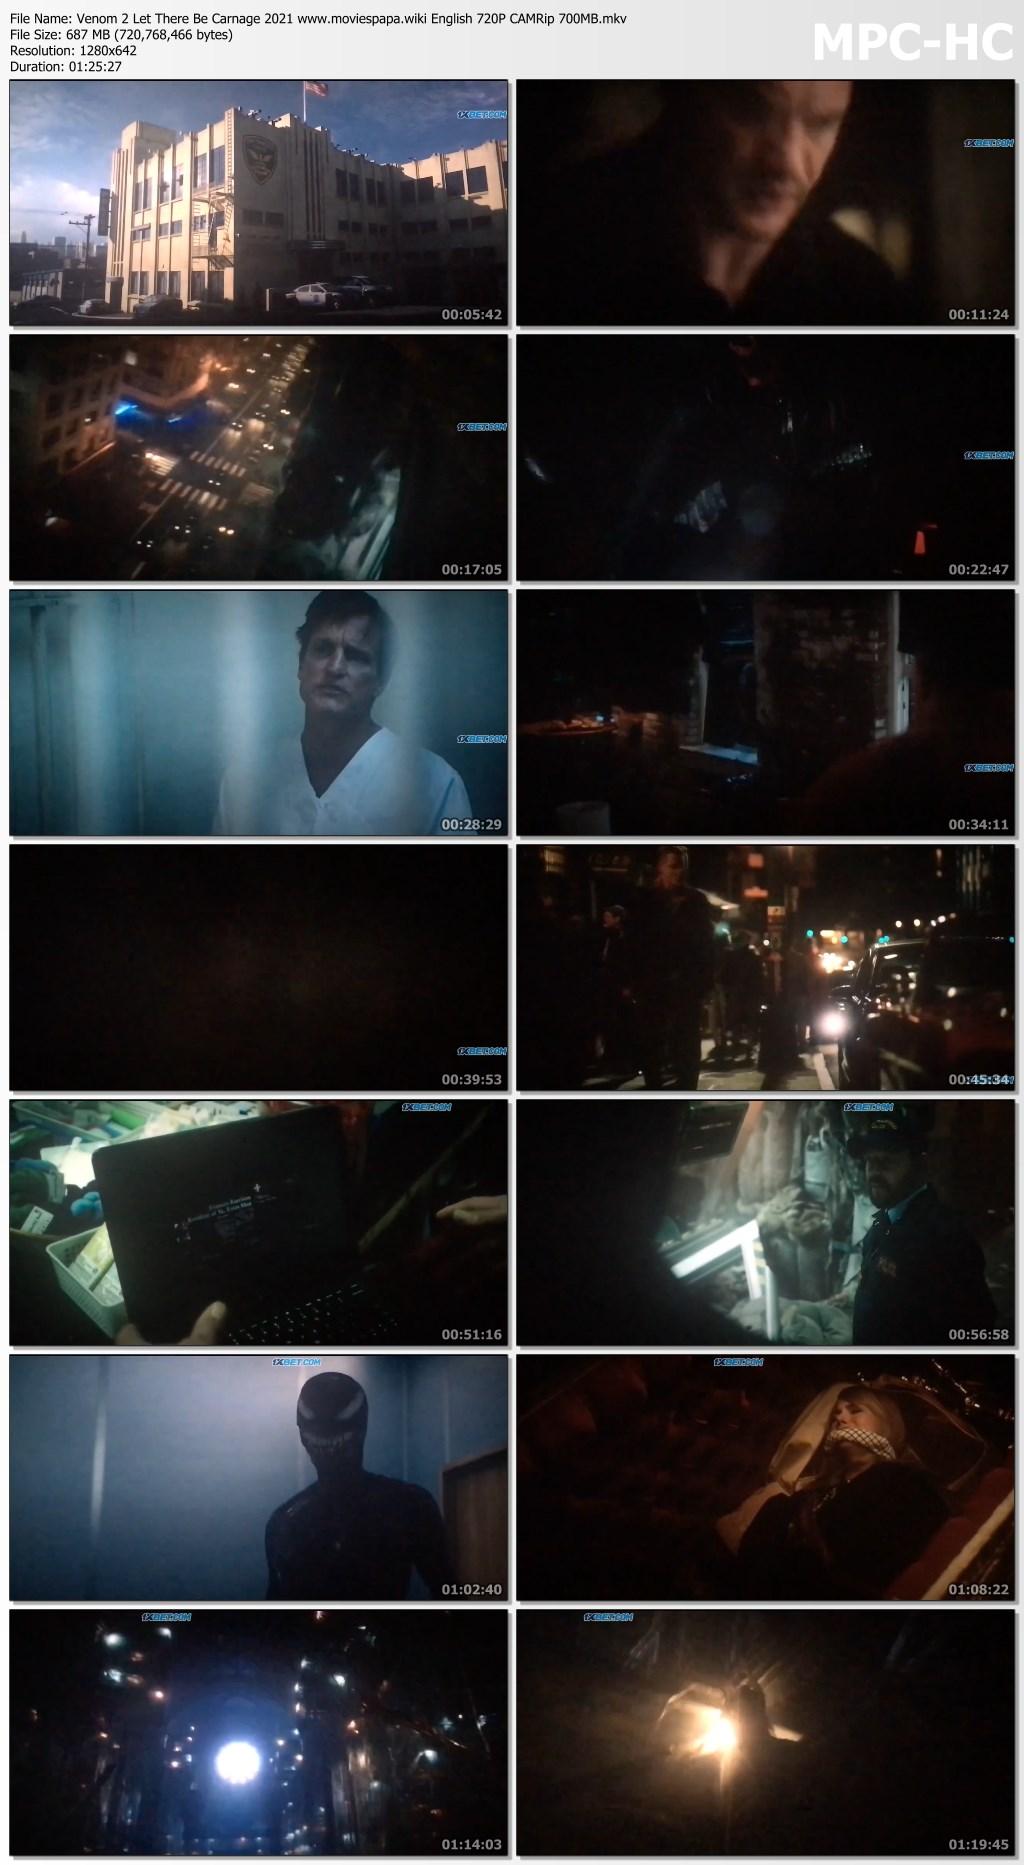 Venom 2 2021 screenshot HDMoviesFair